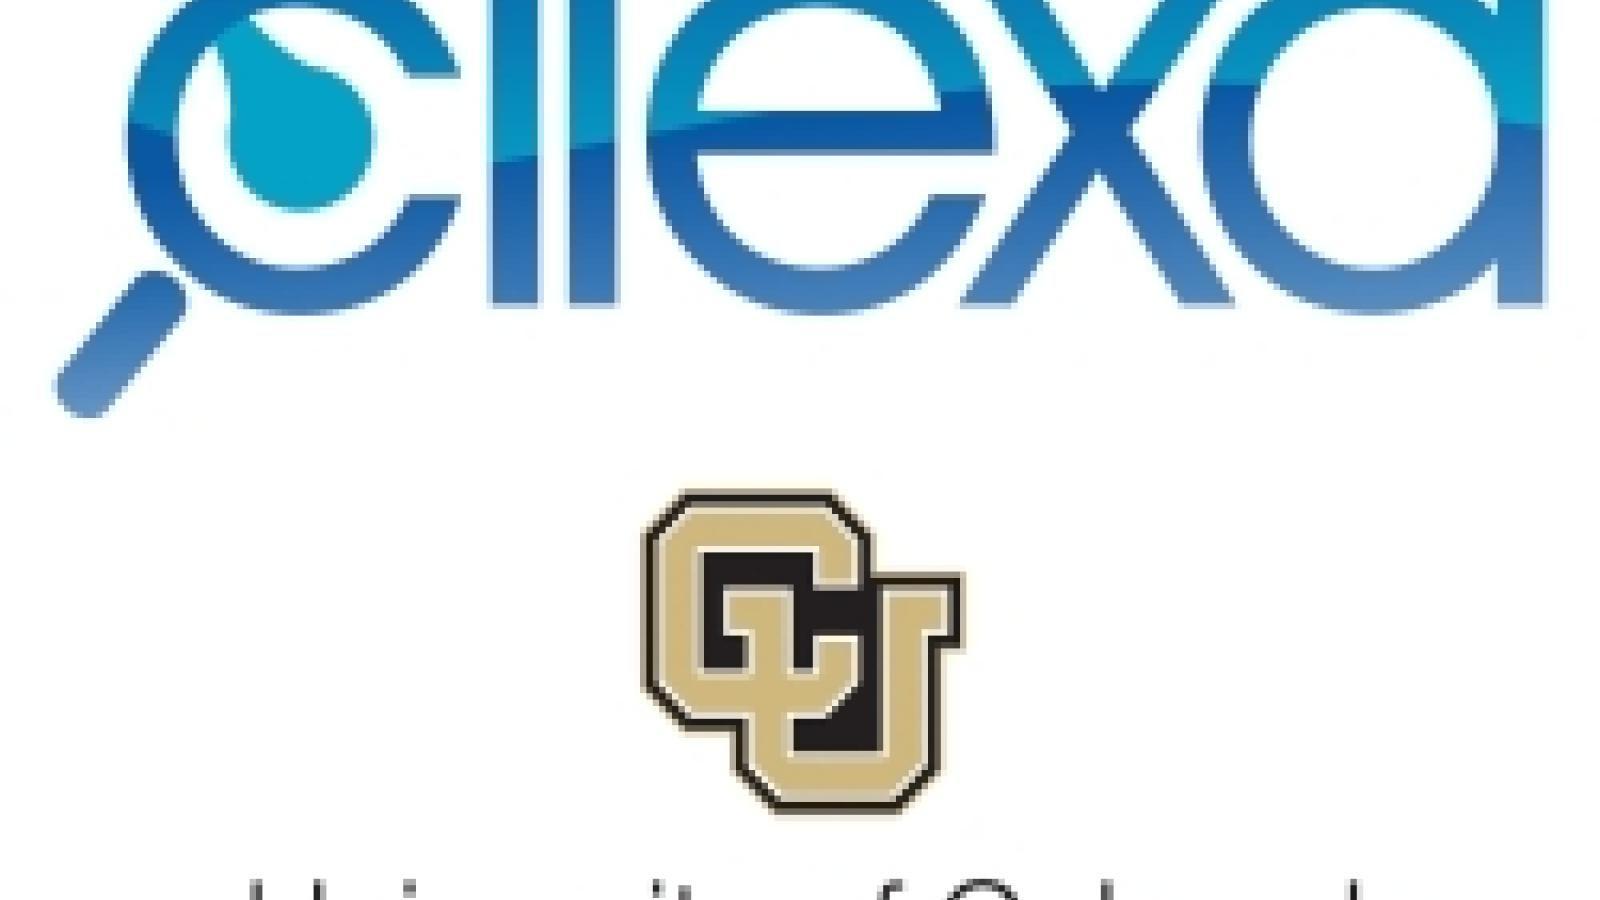 cliexa CU logo